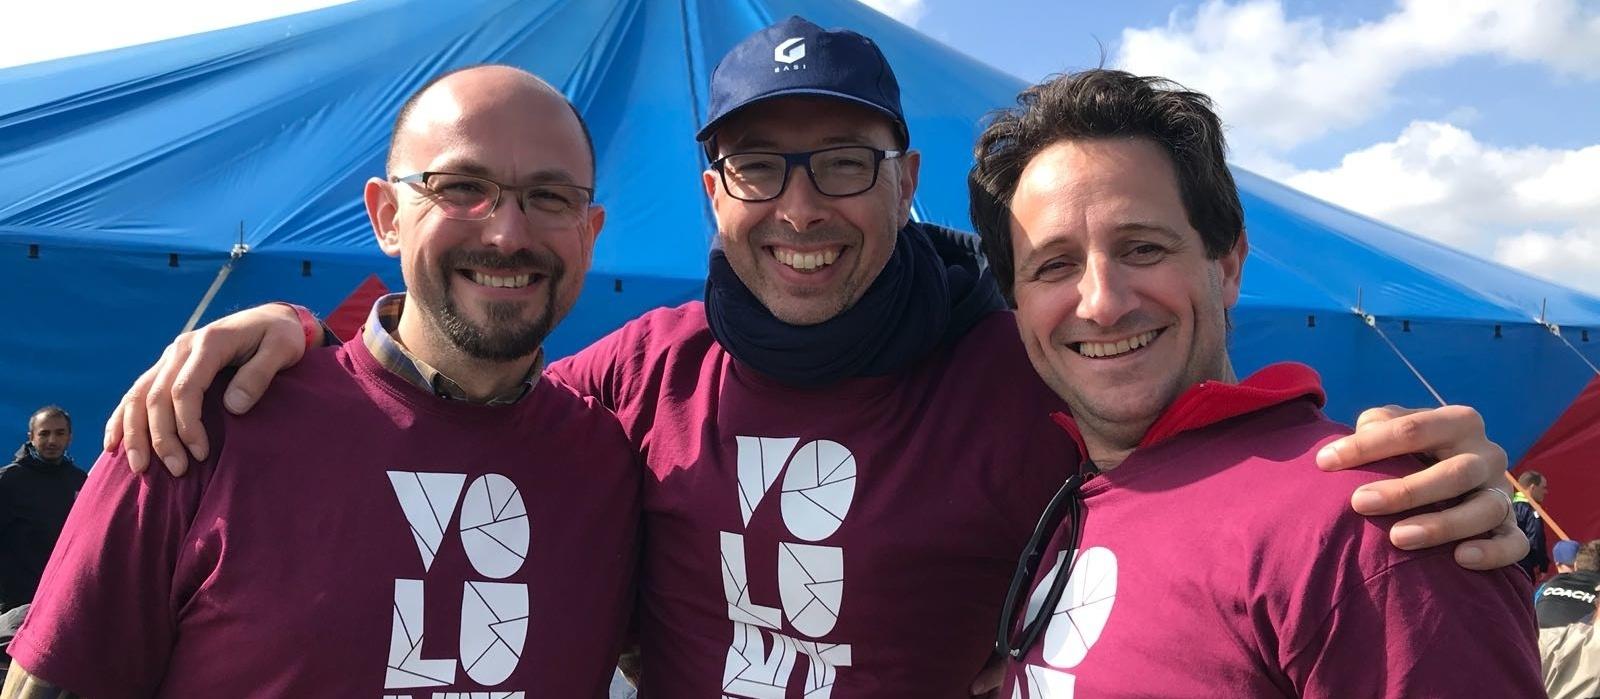 Special Olympics : une aventure humaine avant tout